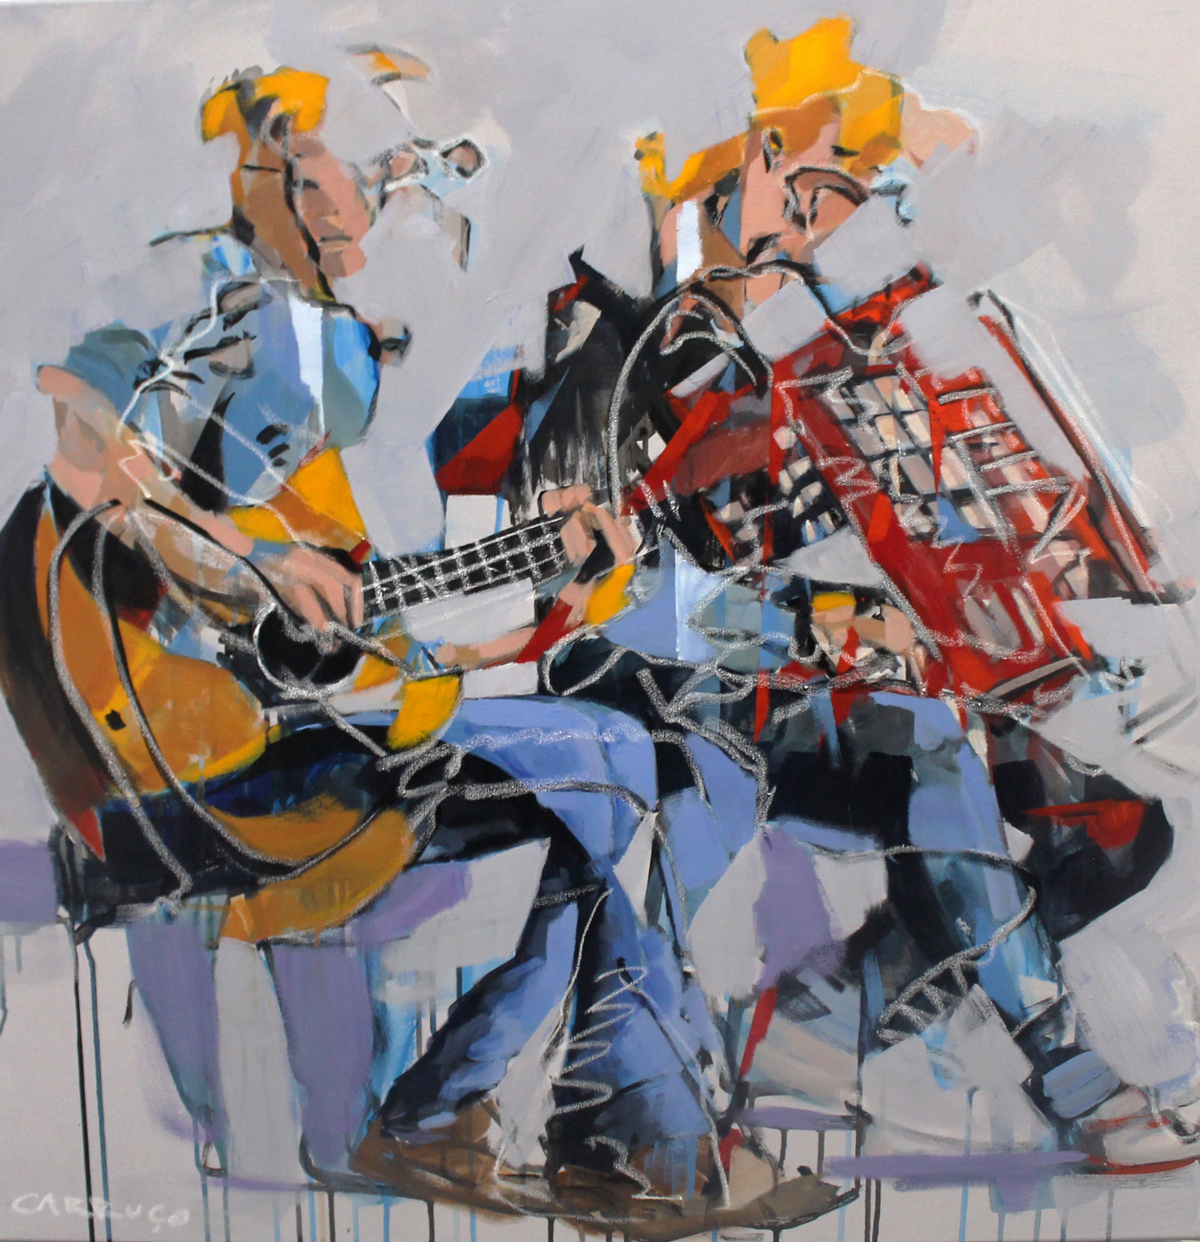 Galeria Pintura Artista Plastico Rui Carruco 2020 Ritmos-Rhythms